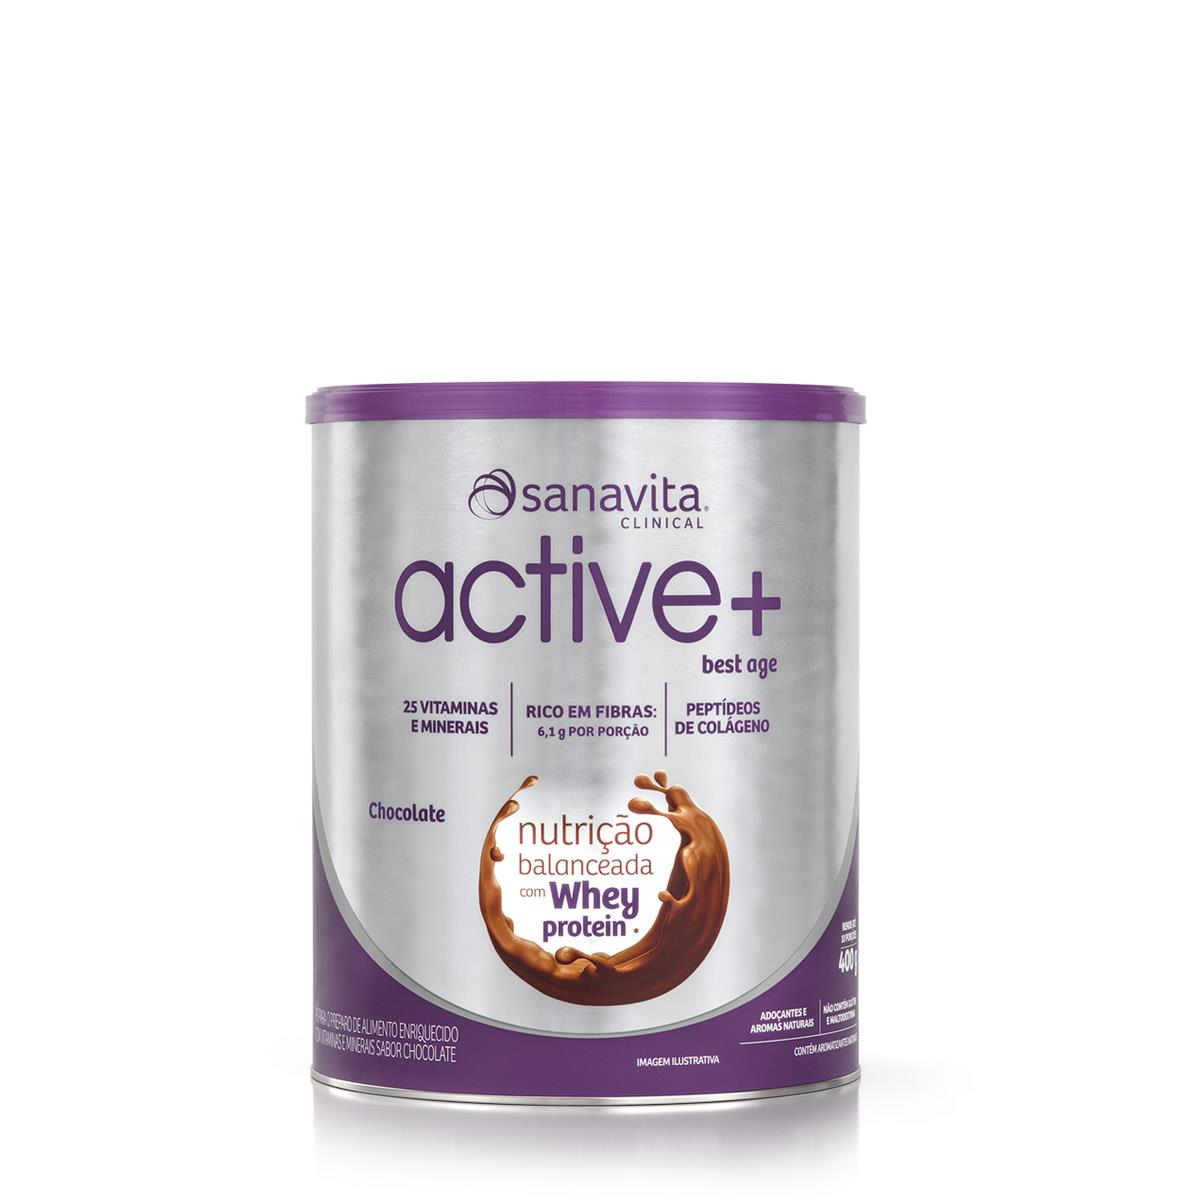 ACTIVE + BEST AGE - CHOCOLATE - 400g - SANAVITA